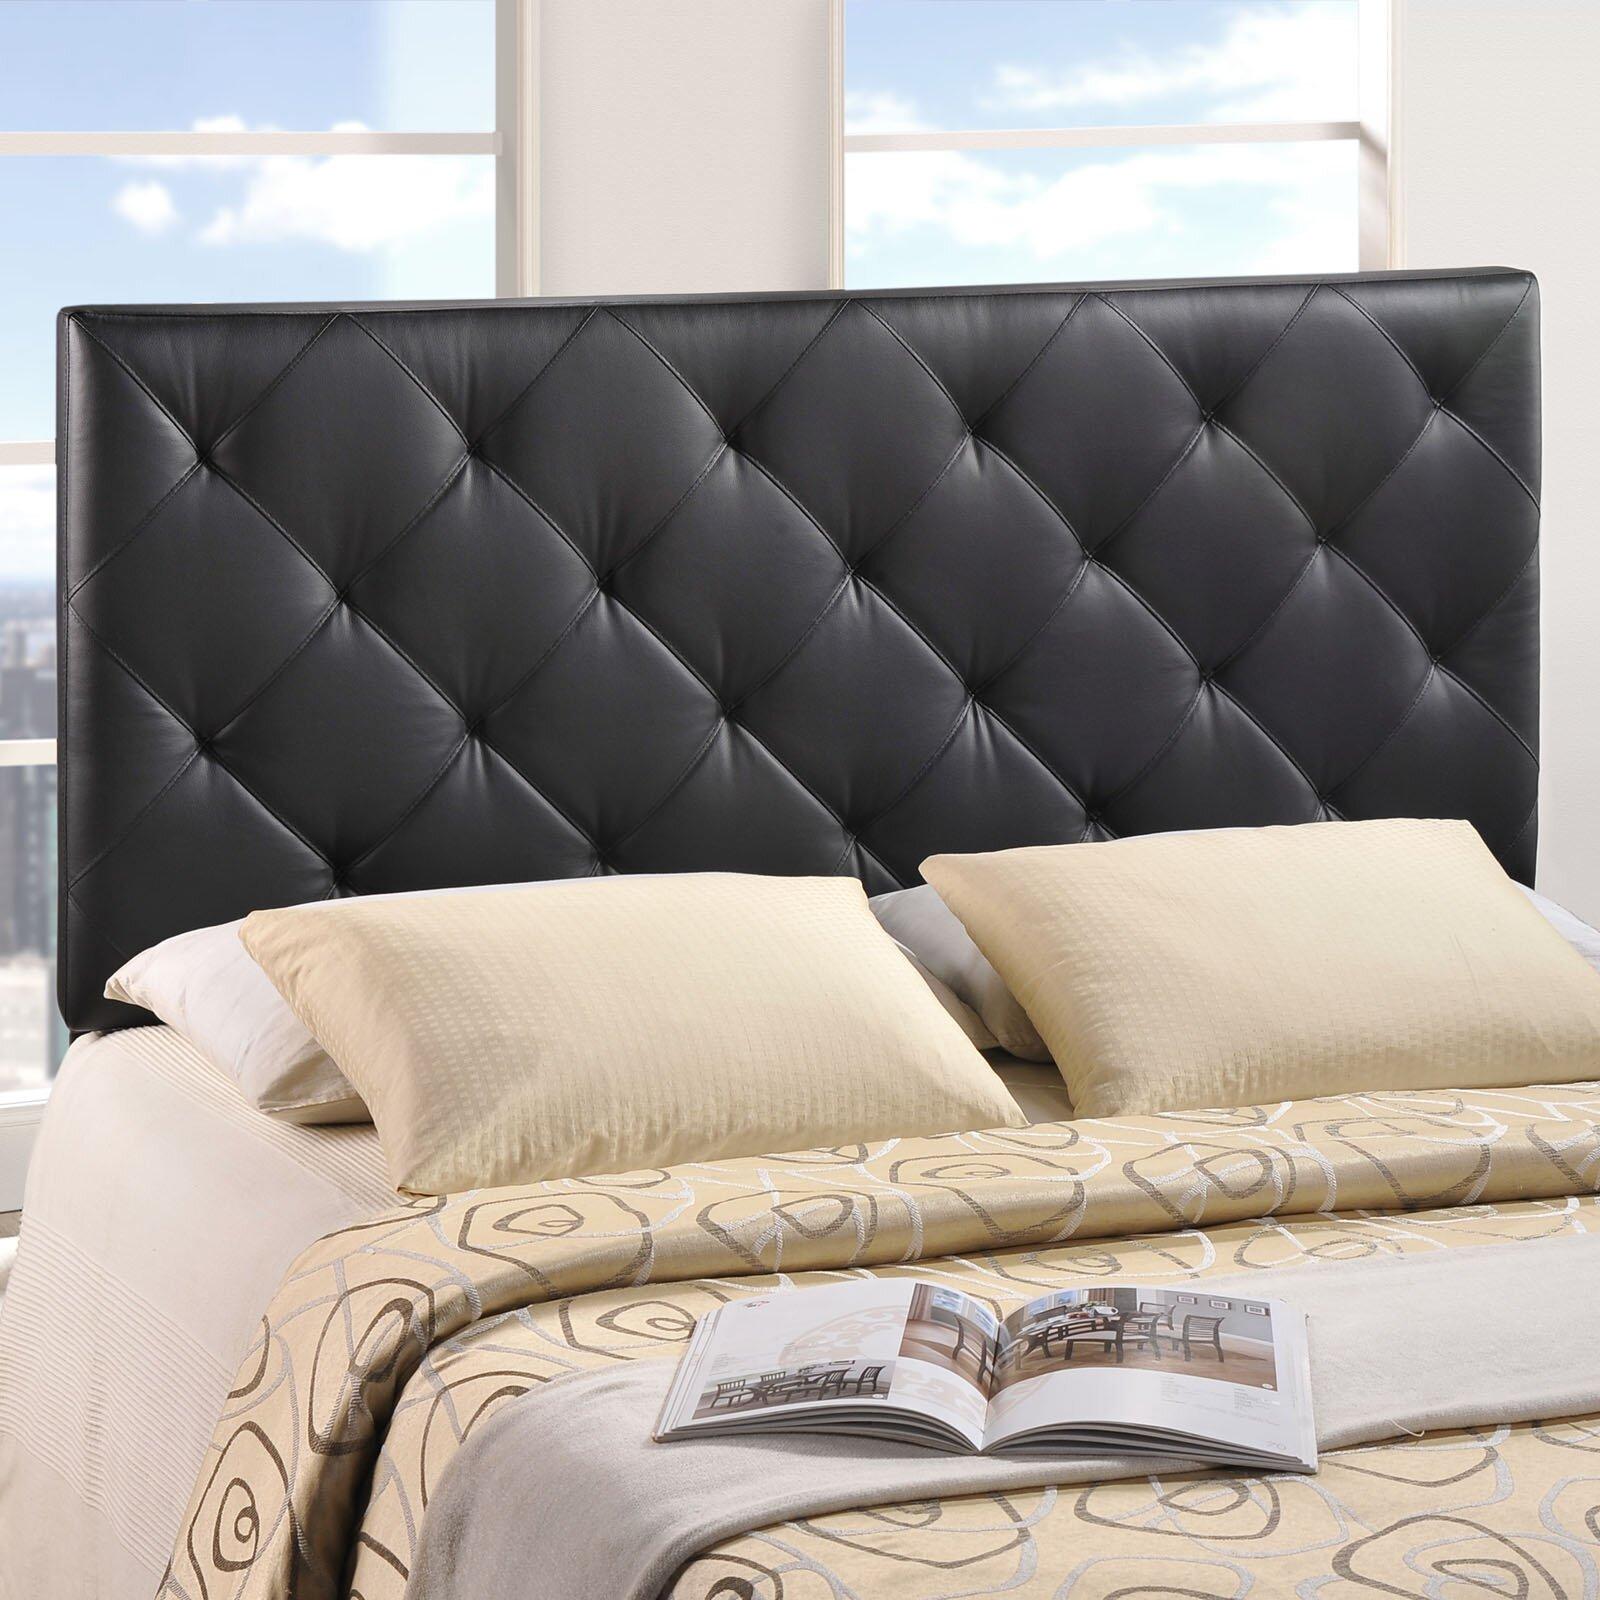 Bed headboard upholstered - Theodore Queen Upholstered Panel Headboard